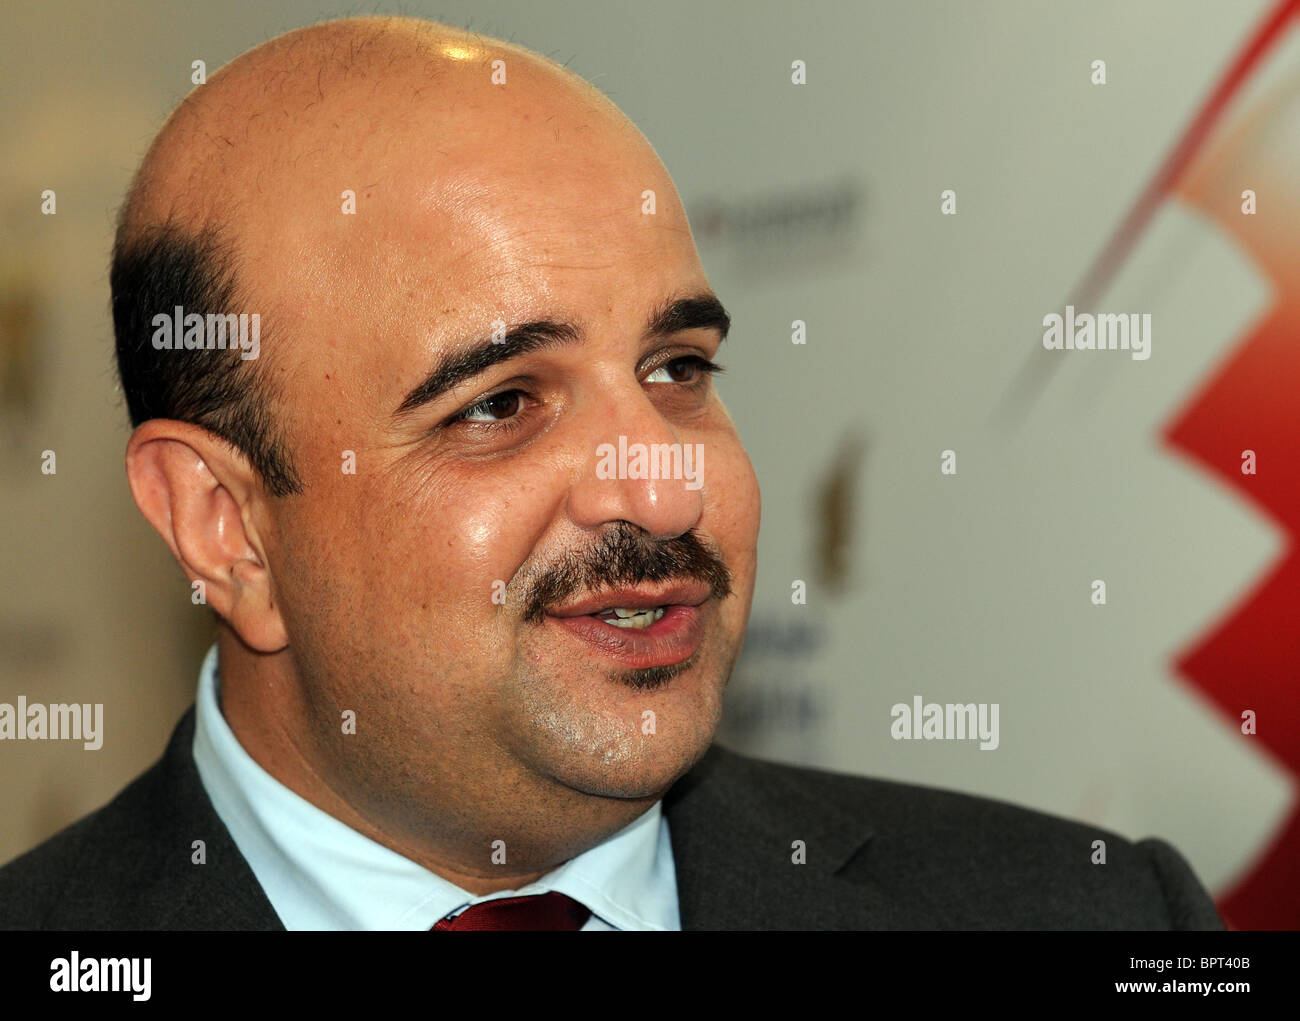 Prince of Bahrain, Shaikh Abdulla bin Hamad Al Khalifa, Sheikh Abdullah Bin Hamad Bin Isa Al-Khalifa - Stock Image